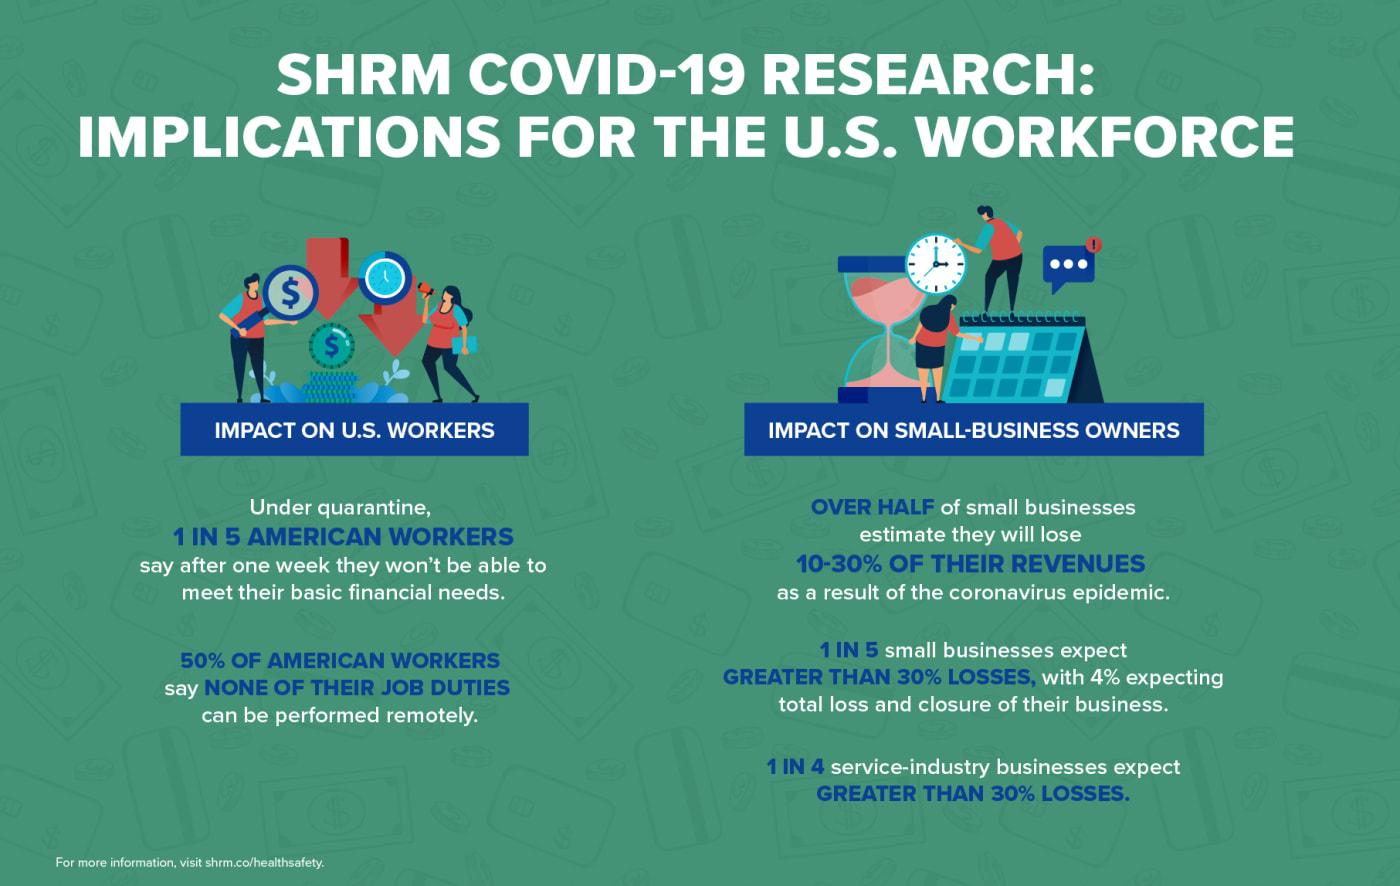 SHRM COVID-19 Research